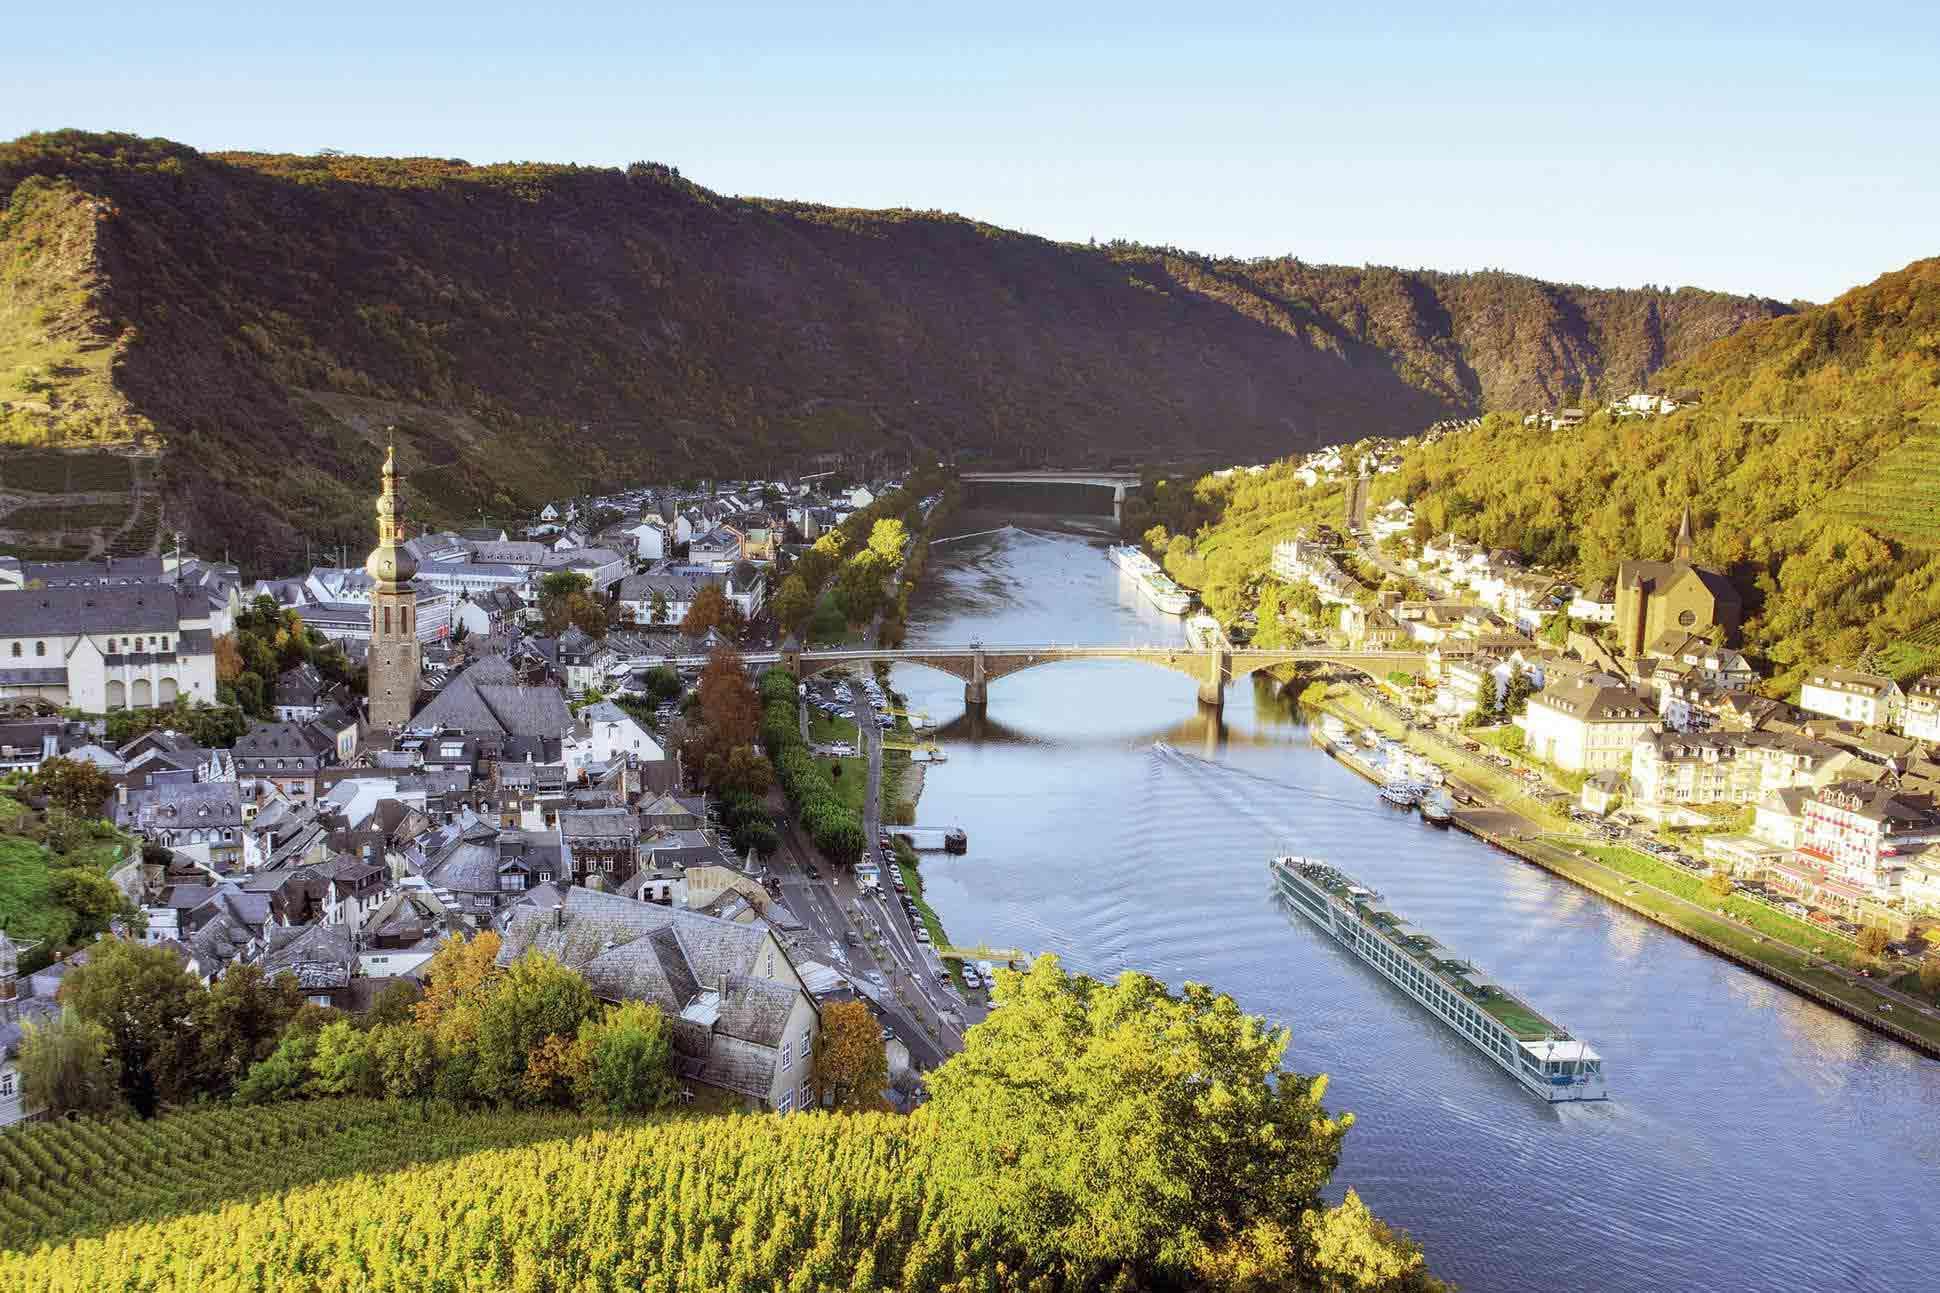 Emerald Waterways cruise, Cochem, Germany